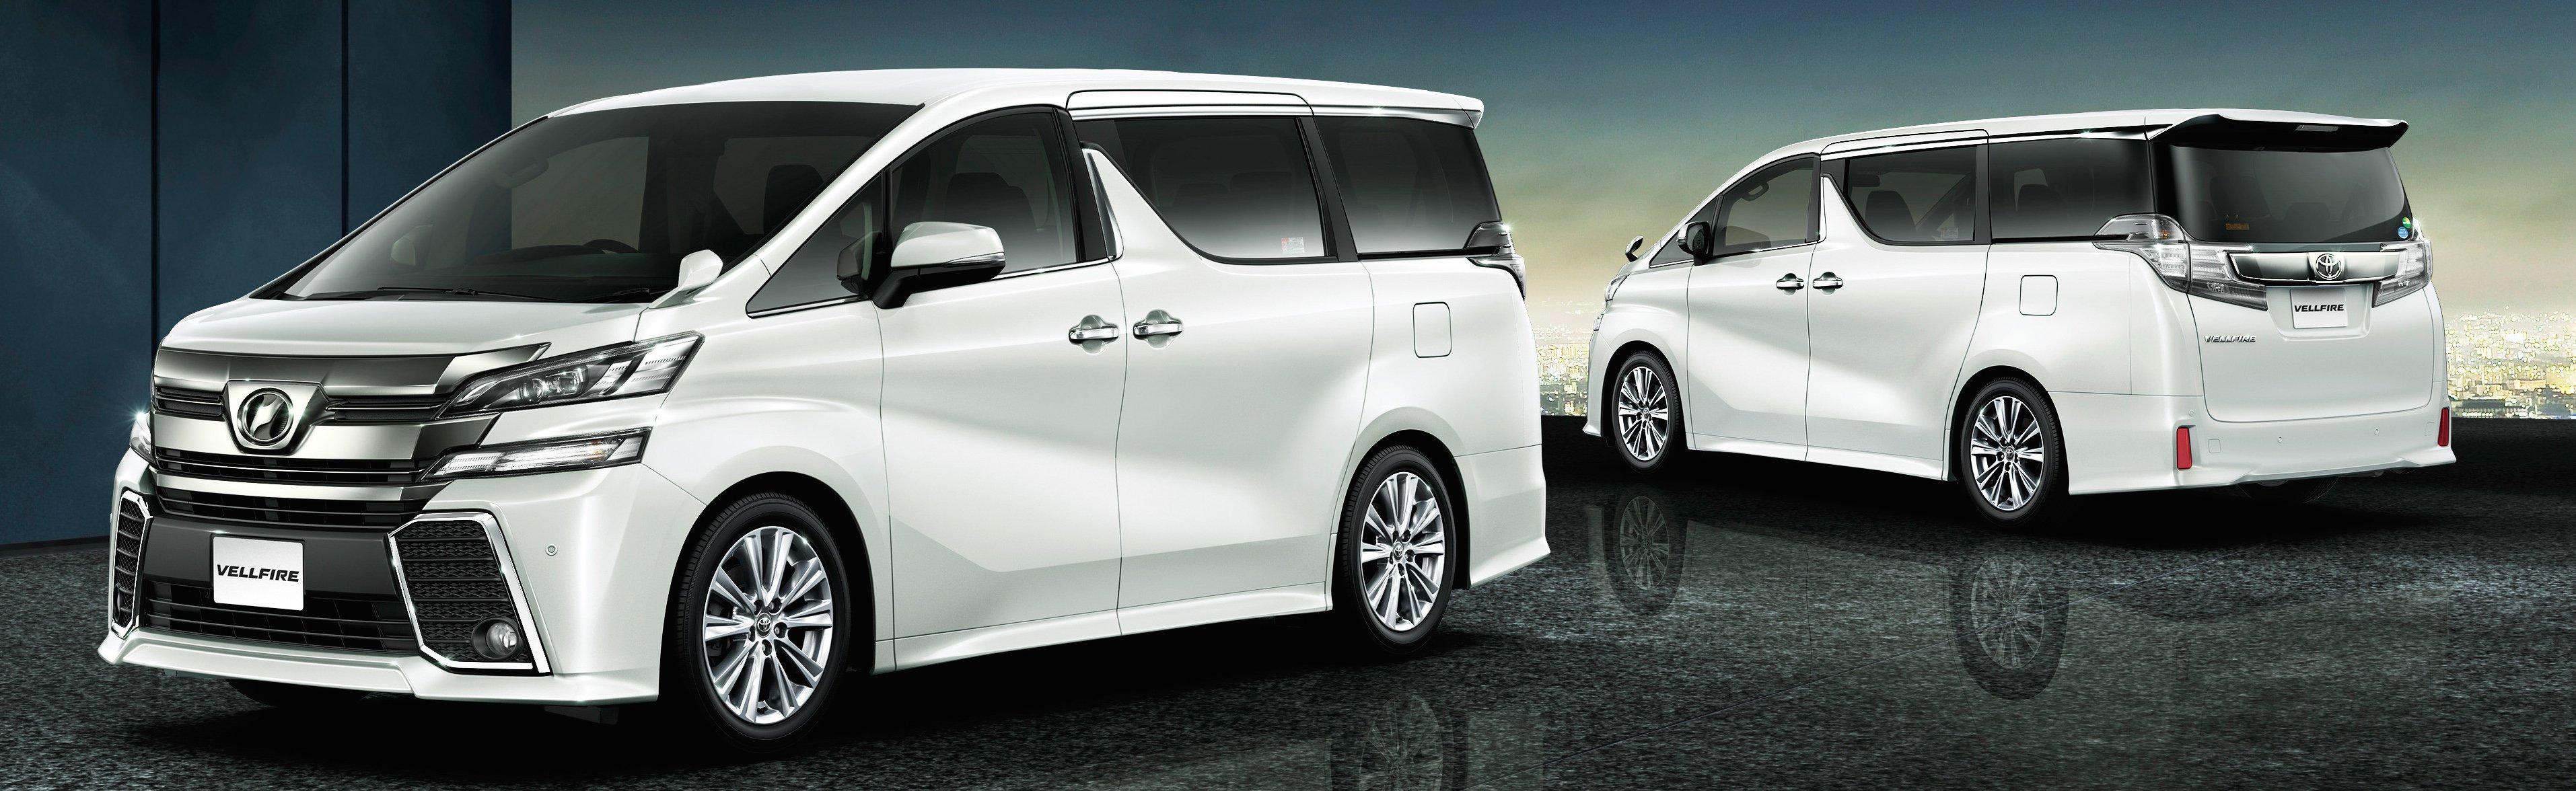 2015-Toyota-Vellfire_006-Vellfire-Z-A-Edition-copy.jpg